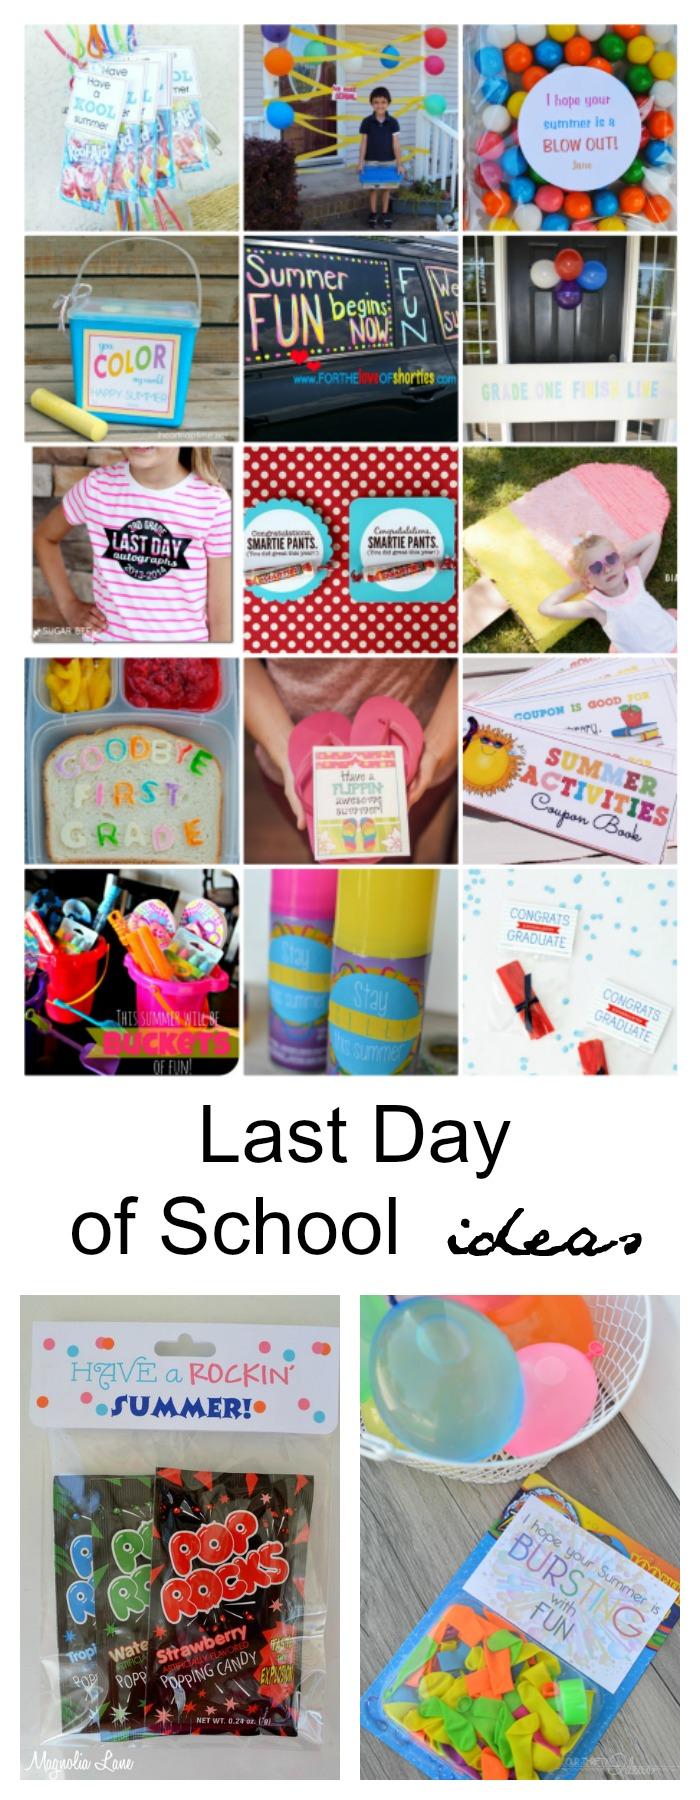 Last-Day-of-School-Ideas-Pin